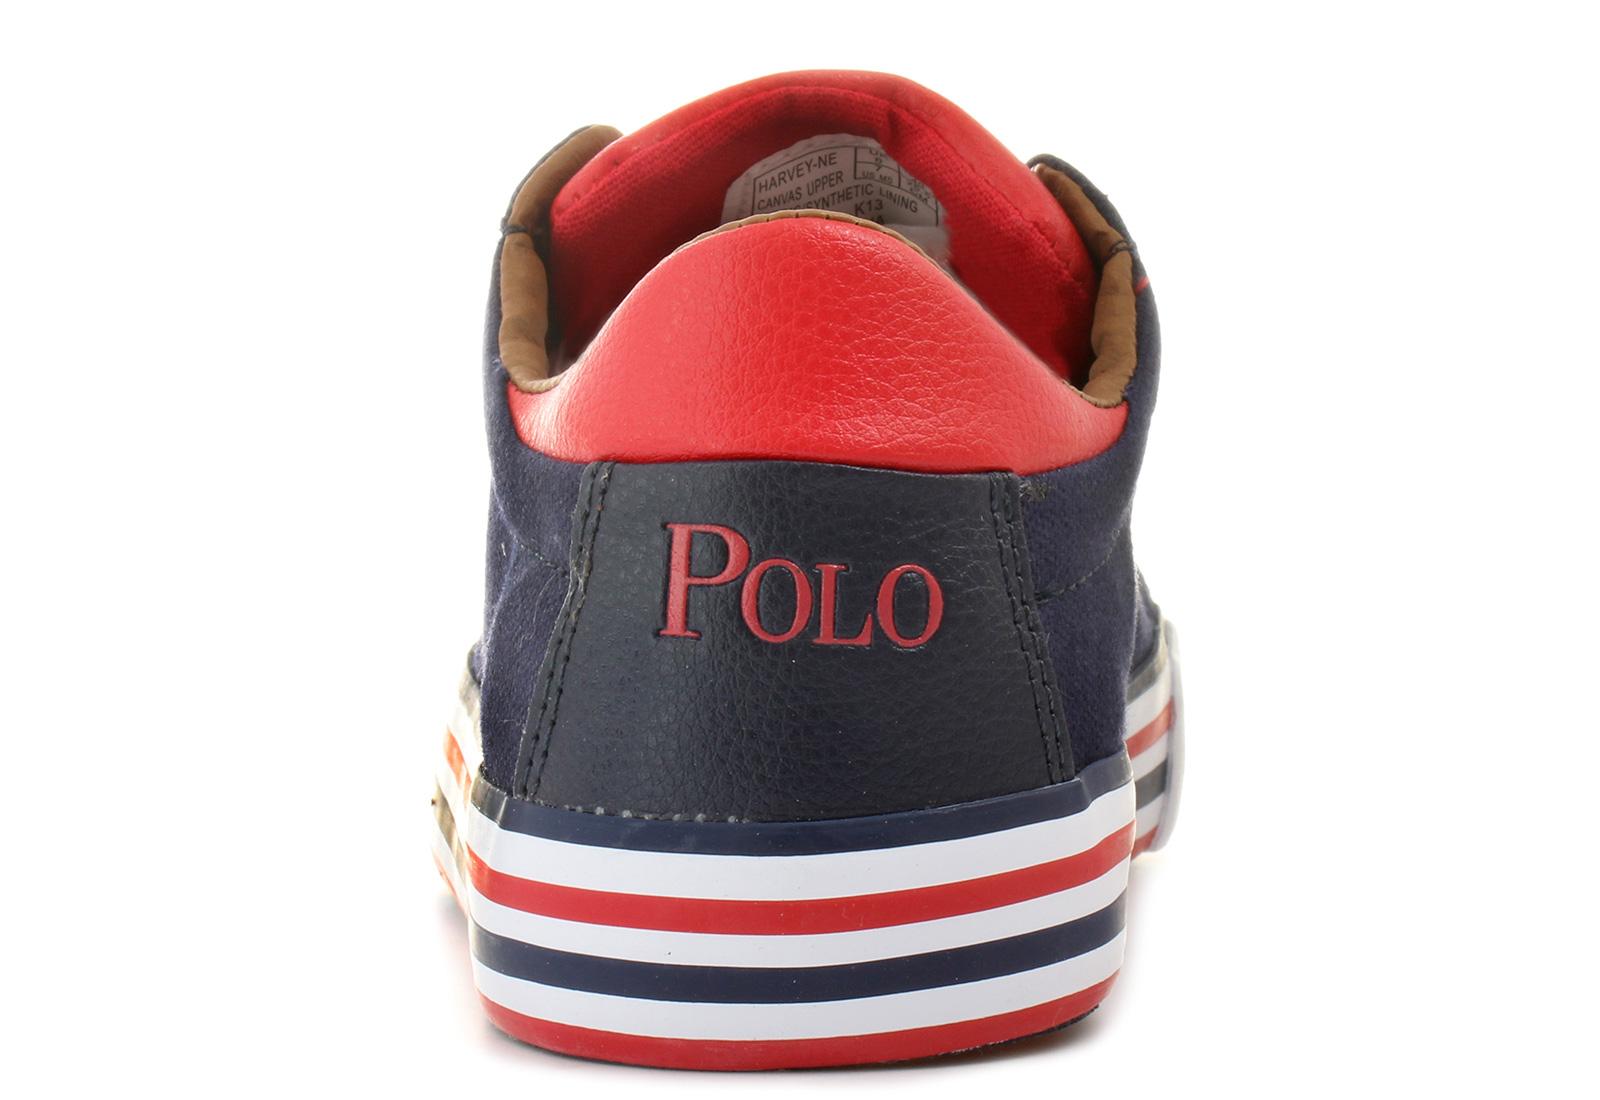 88843ca109 Polo Ralph Lauren Tenisky - Harvey-ne - 296-c-w48nr - Tenisky ...